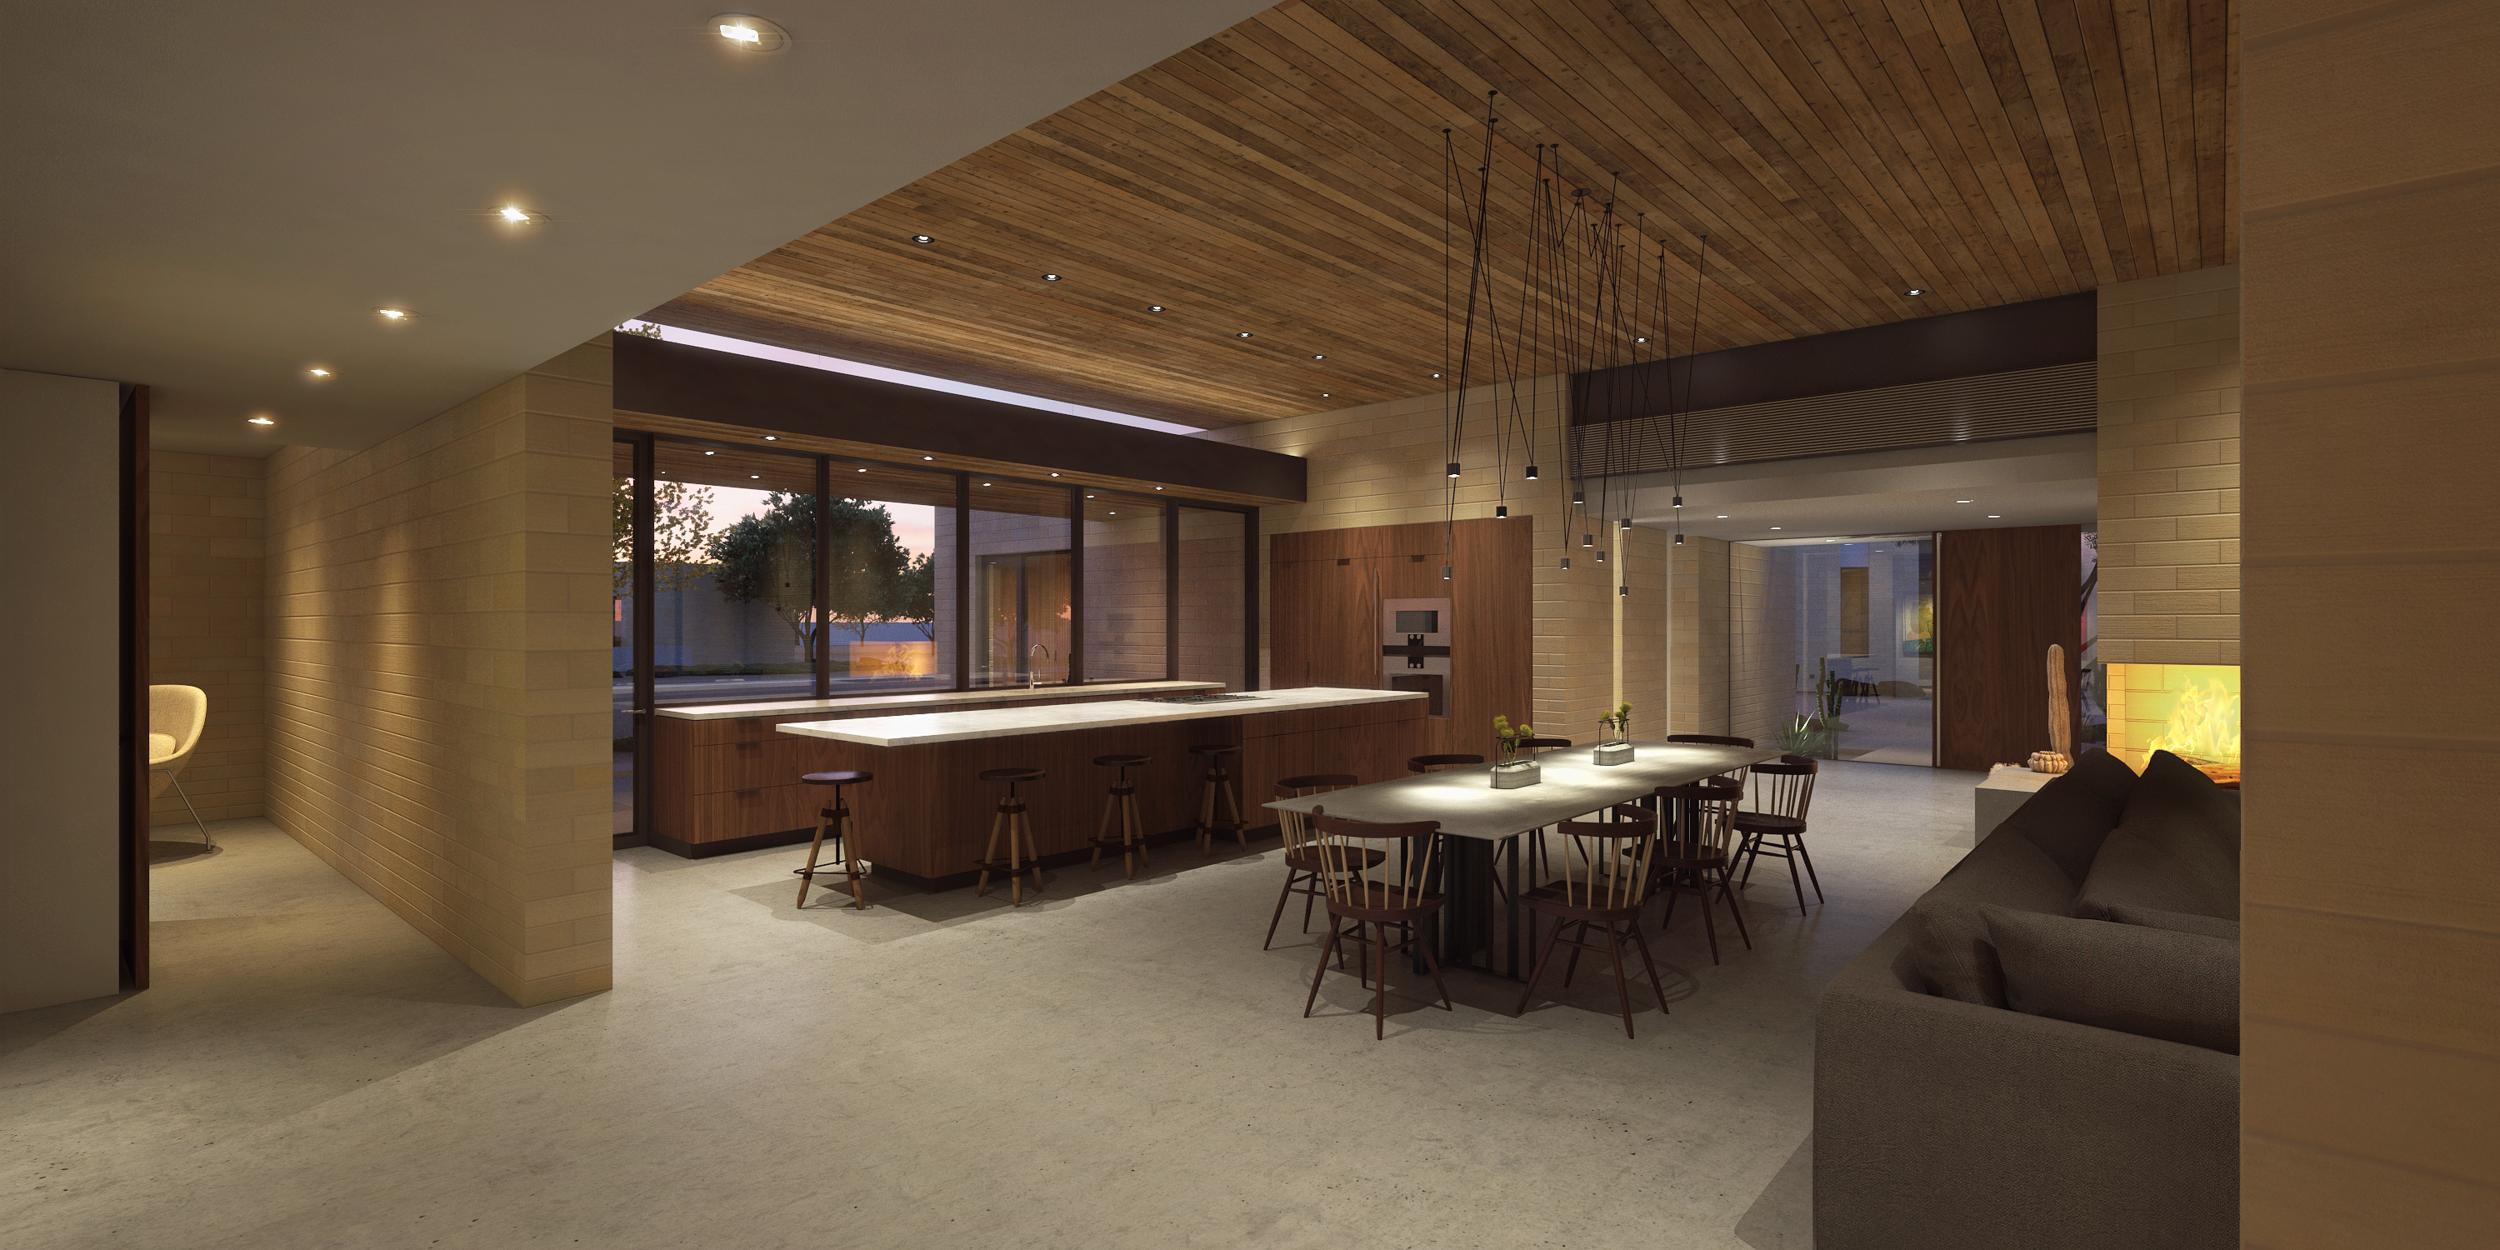 Palo Verde Lane - 3D modeling, rendering, virtual tour, & web design